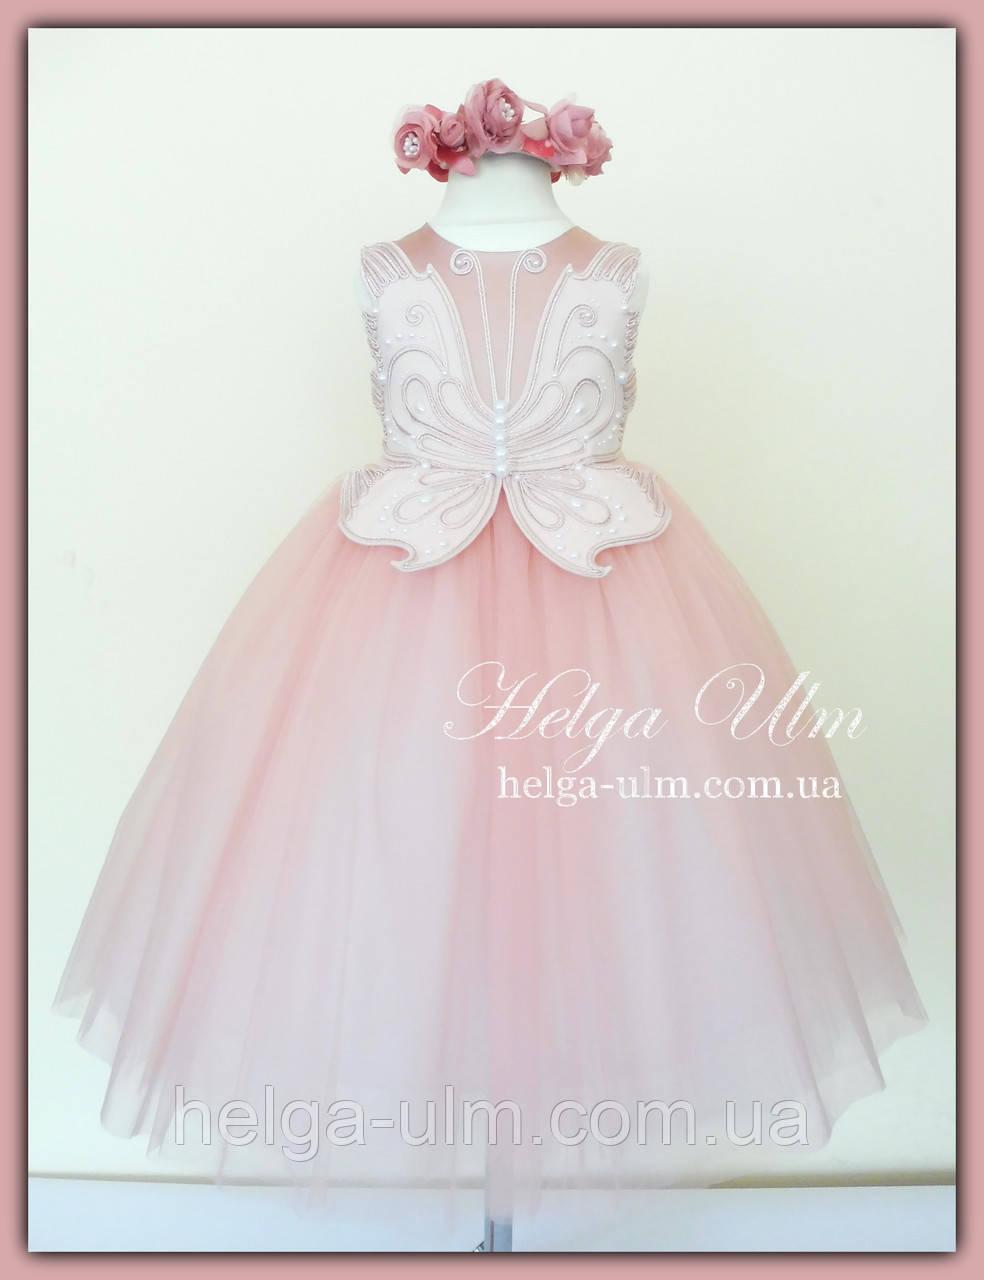 "Пишна бальна сукня для дівчинки ""Метелик"" - РУЧНА РОБОТА! 116 р."